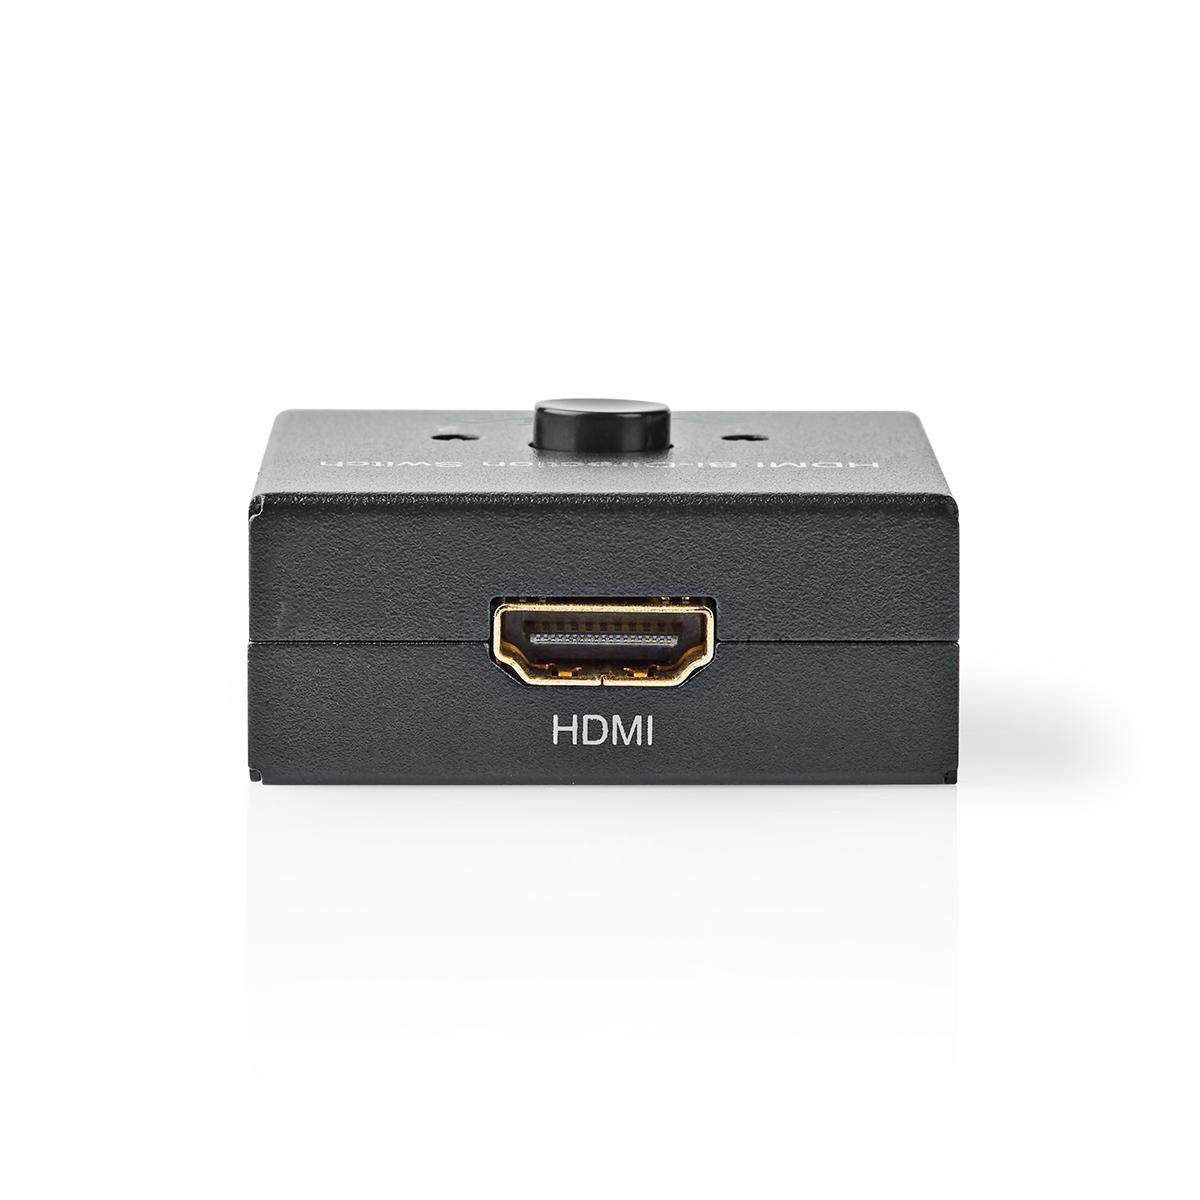 Hdmi Bi Directional Switch 2x Hdmi Output 1x Hdmi Input 2x Hdmi Input 1x Hdmi Output 4k2k 60fps Hdcp2 2 Nedis